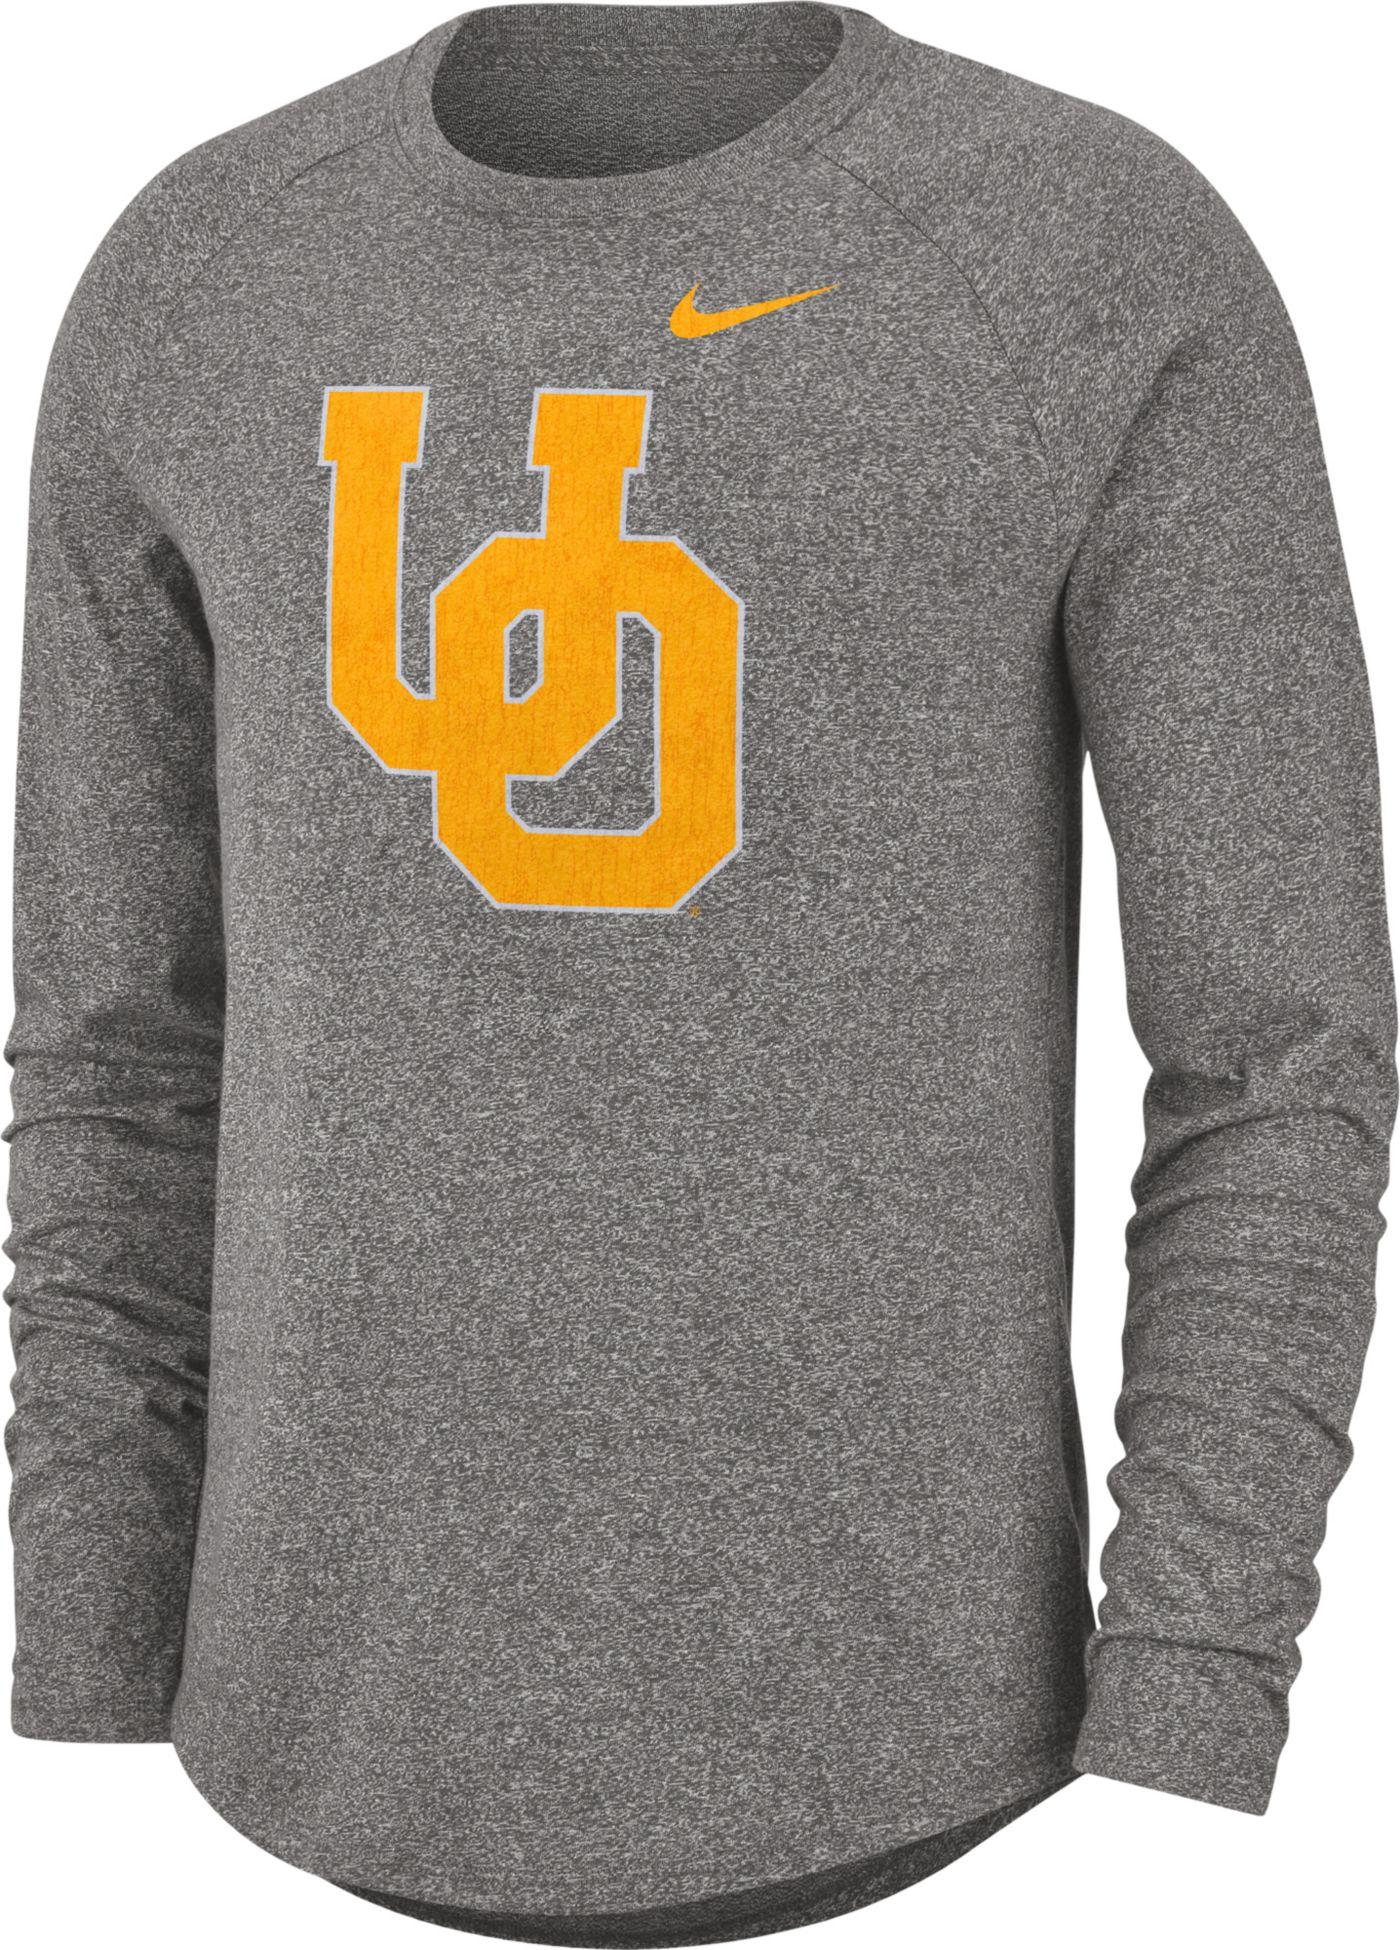 Nike Men's Oregon Ducks Grey Marled Raglan Long Sleeve T-Shirt